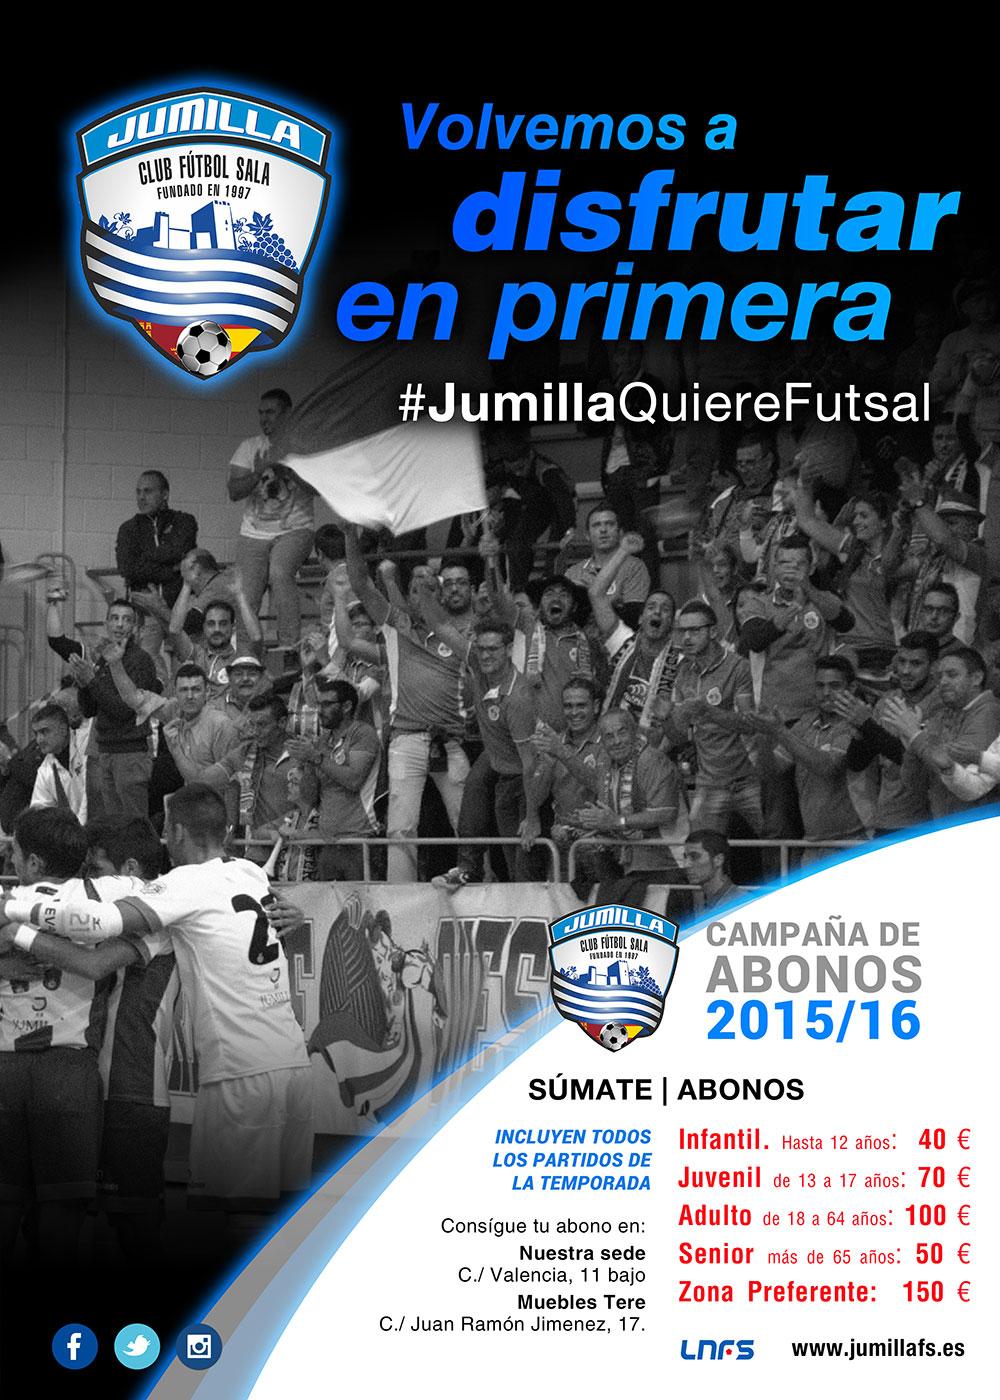 Cartel-abonados-jumilla-fs-2015-2016